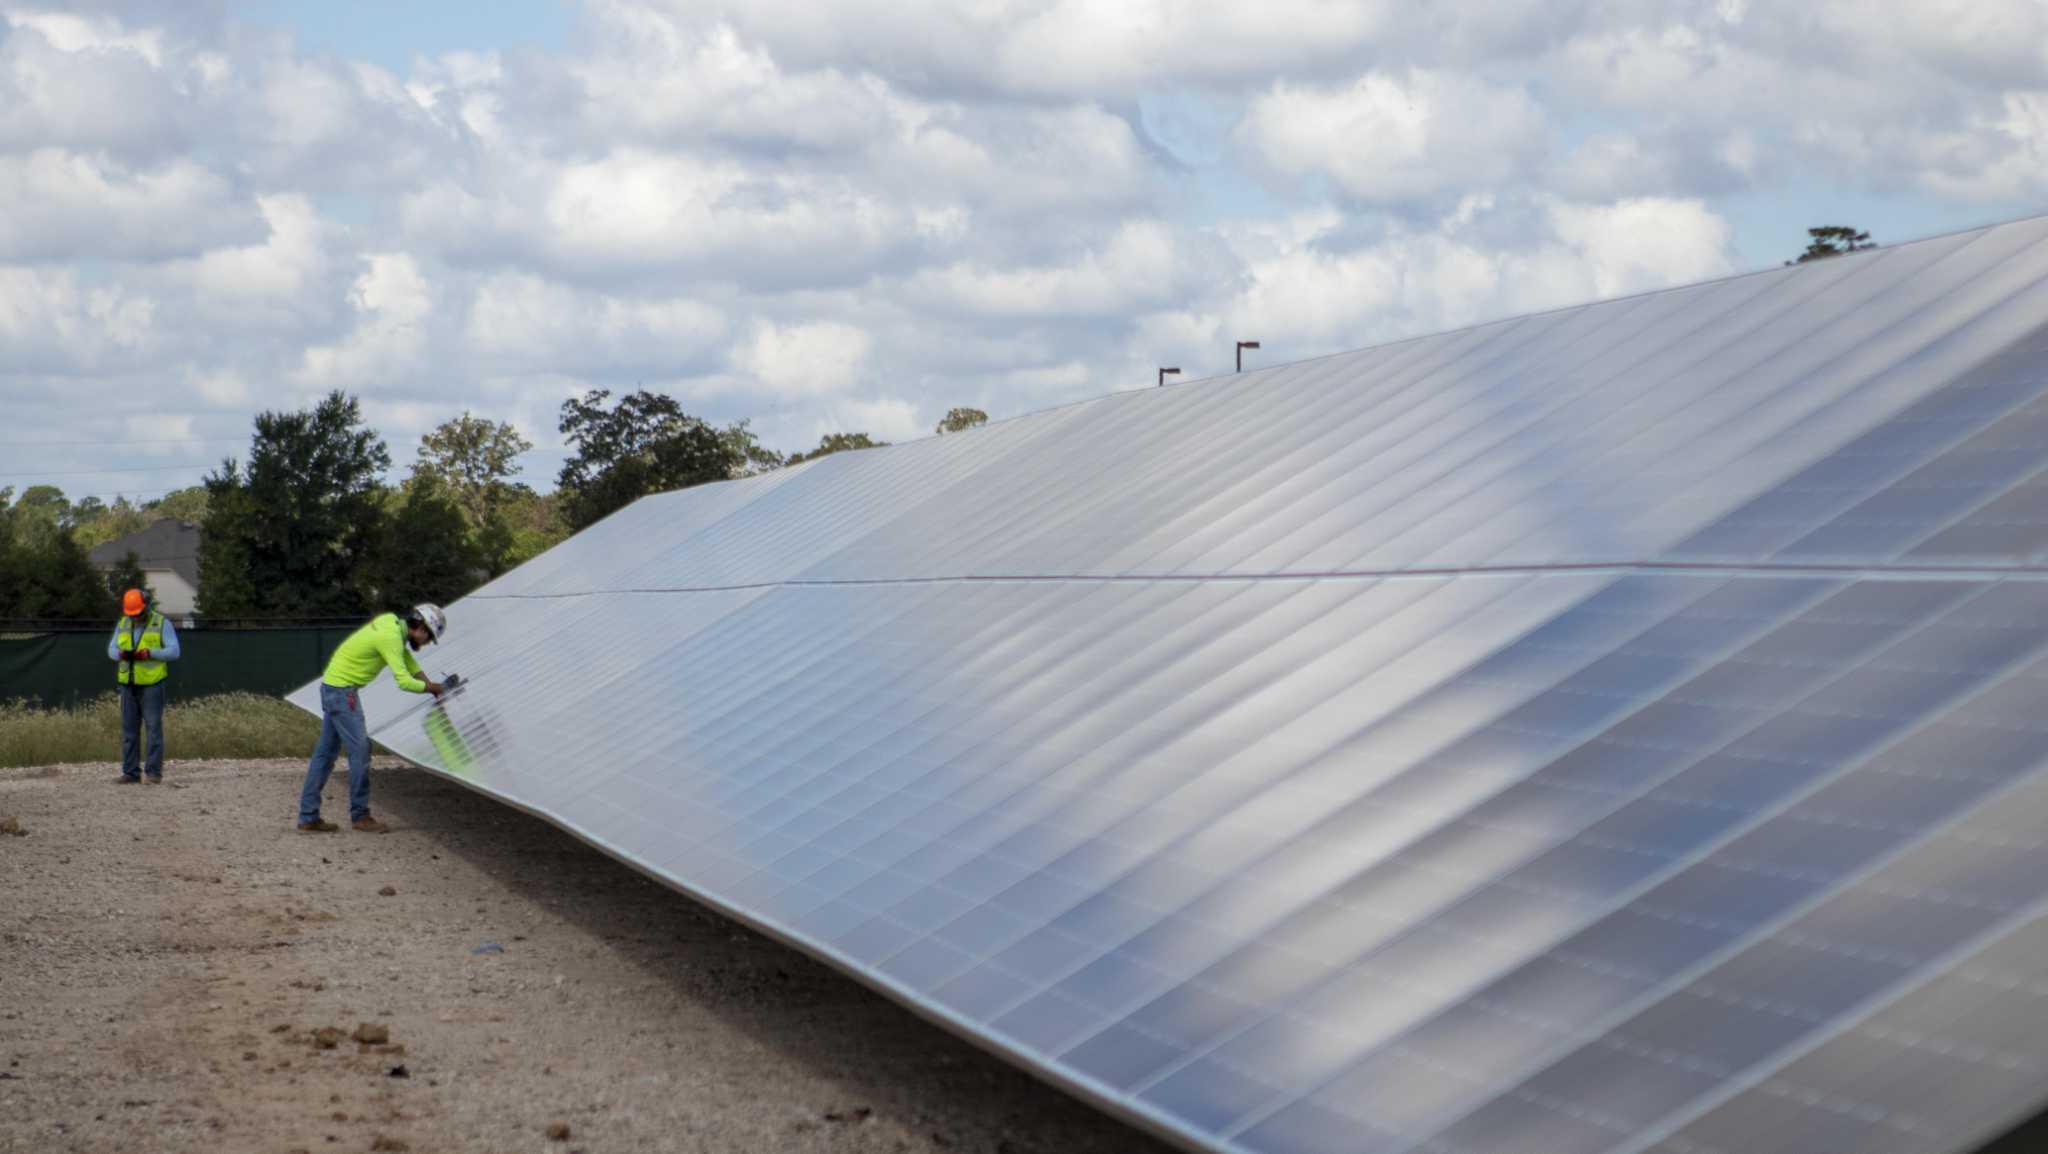 Private equity, venture capital putting money into solar development